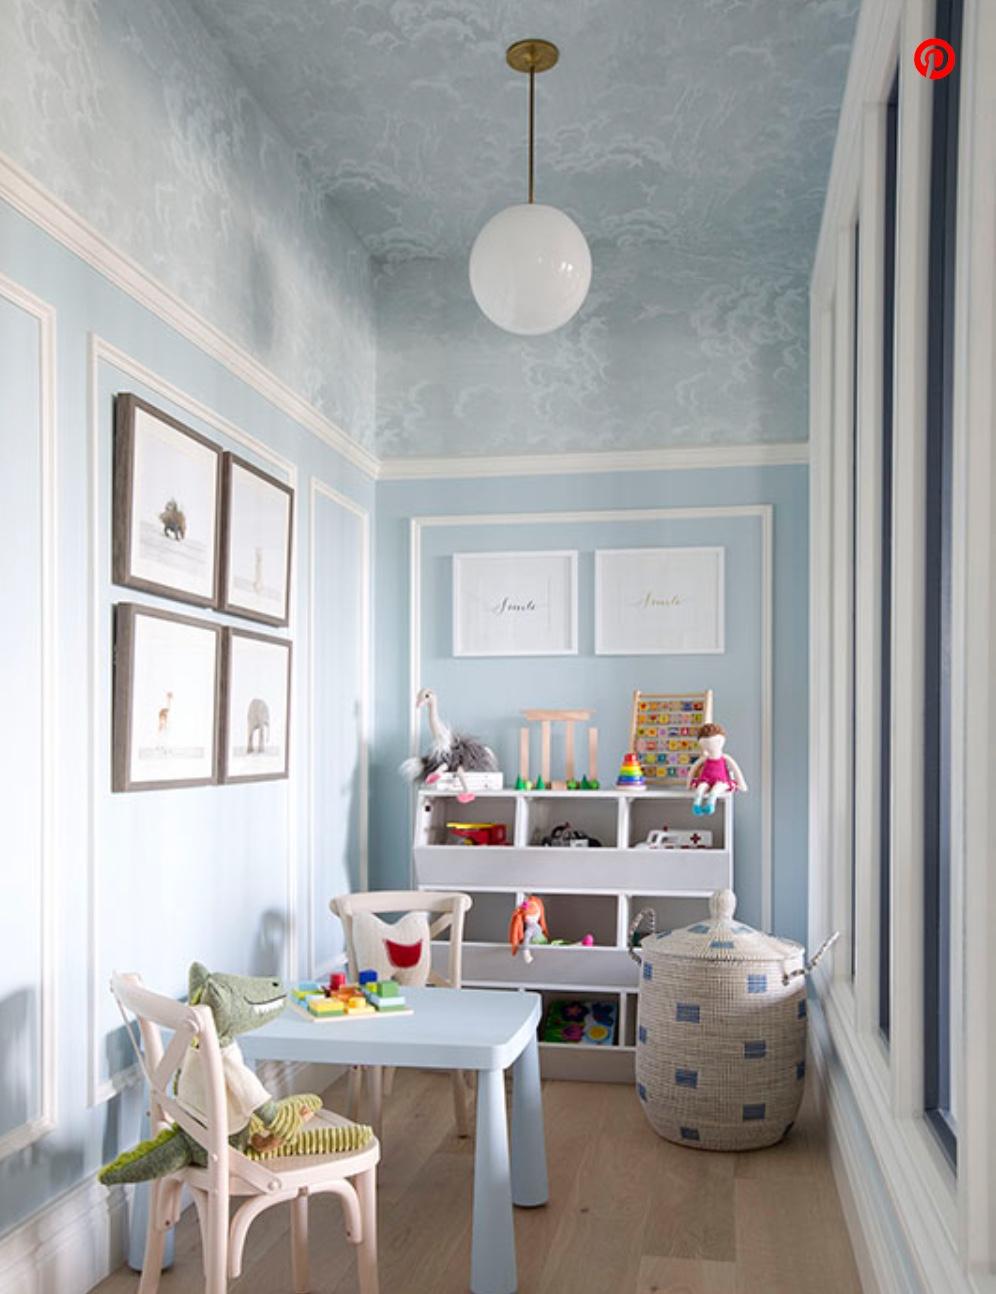 Dental Office Playroom by Summer Thornton Design